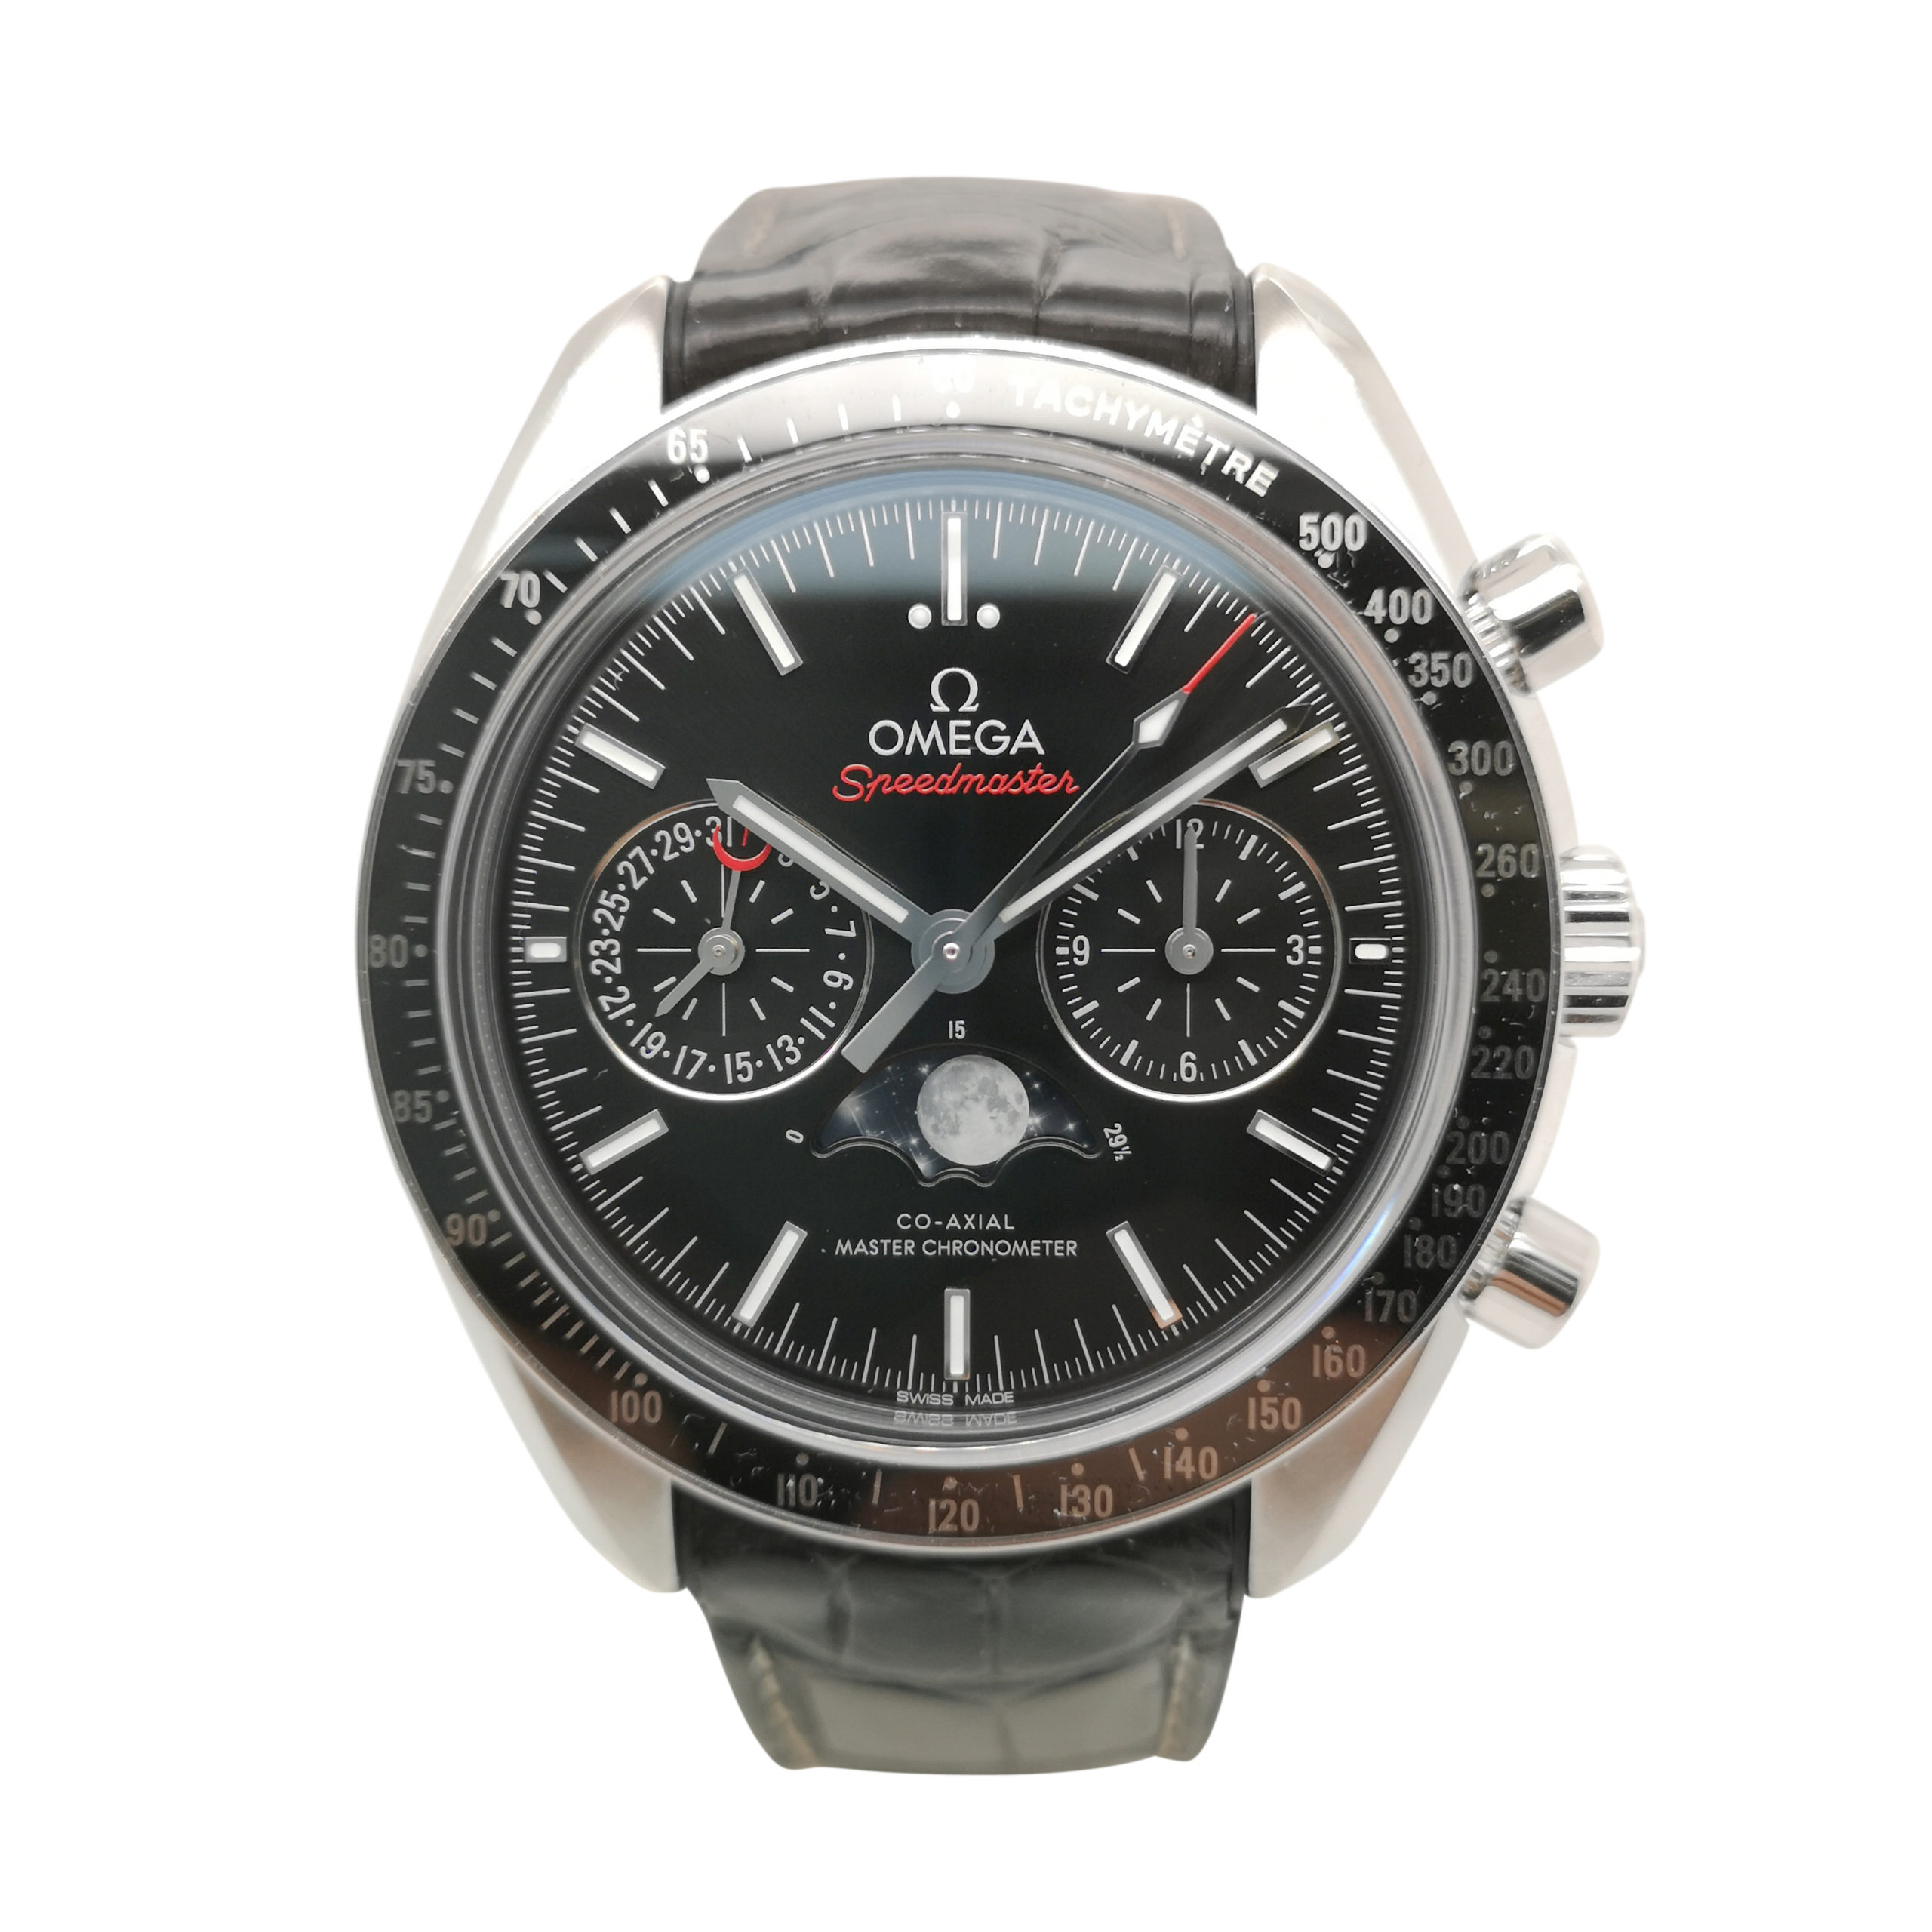 Omega Speedmaster Moonphase Watch